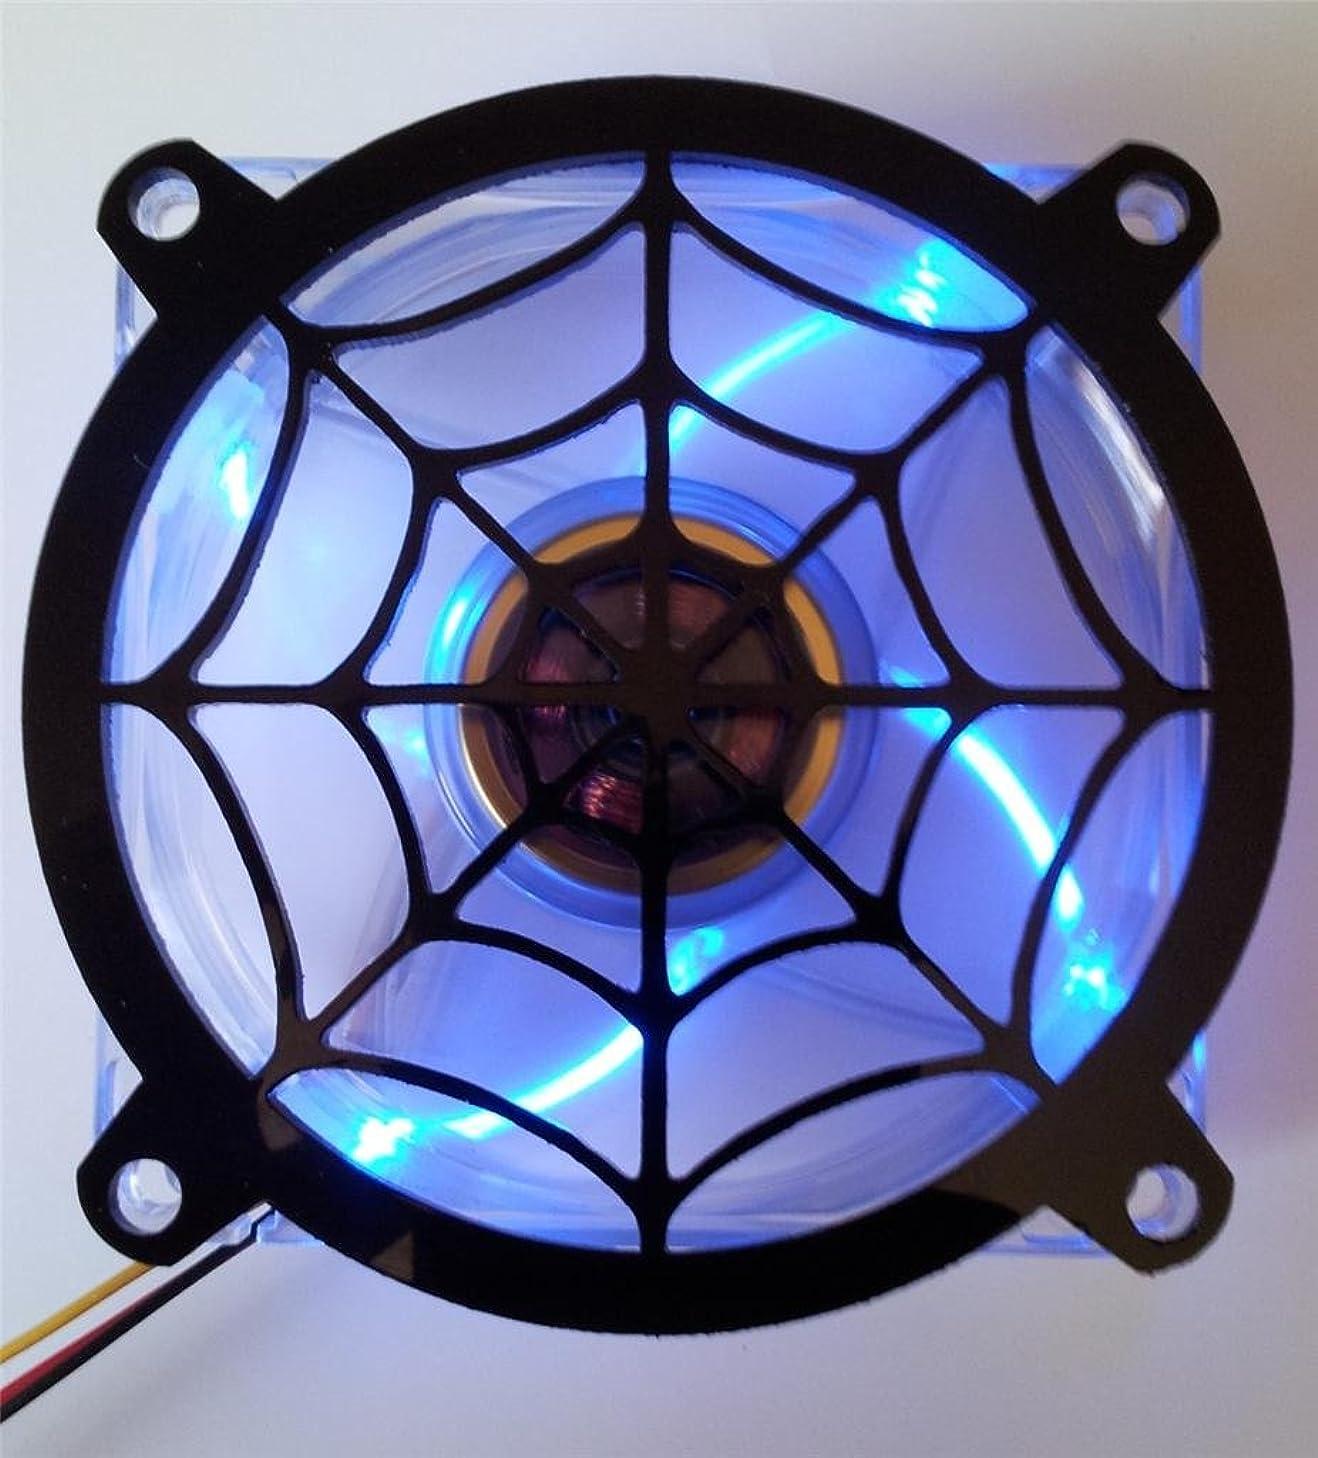 Custom Acrylic Spider Web Computer Fan Grill 120mm